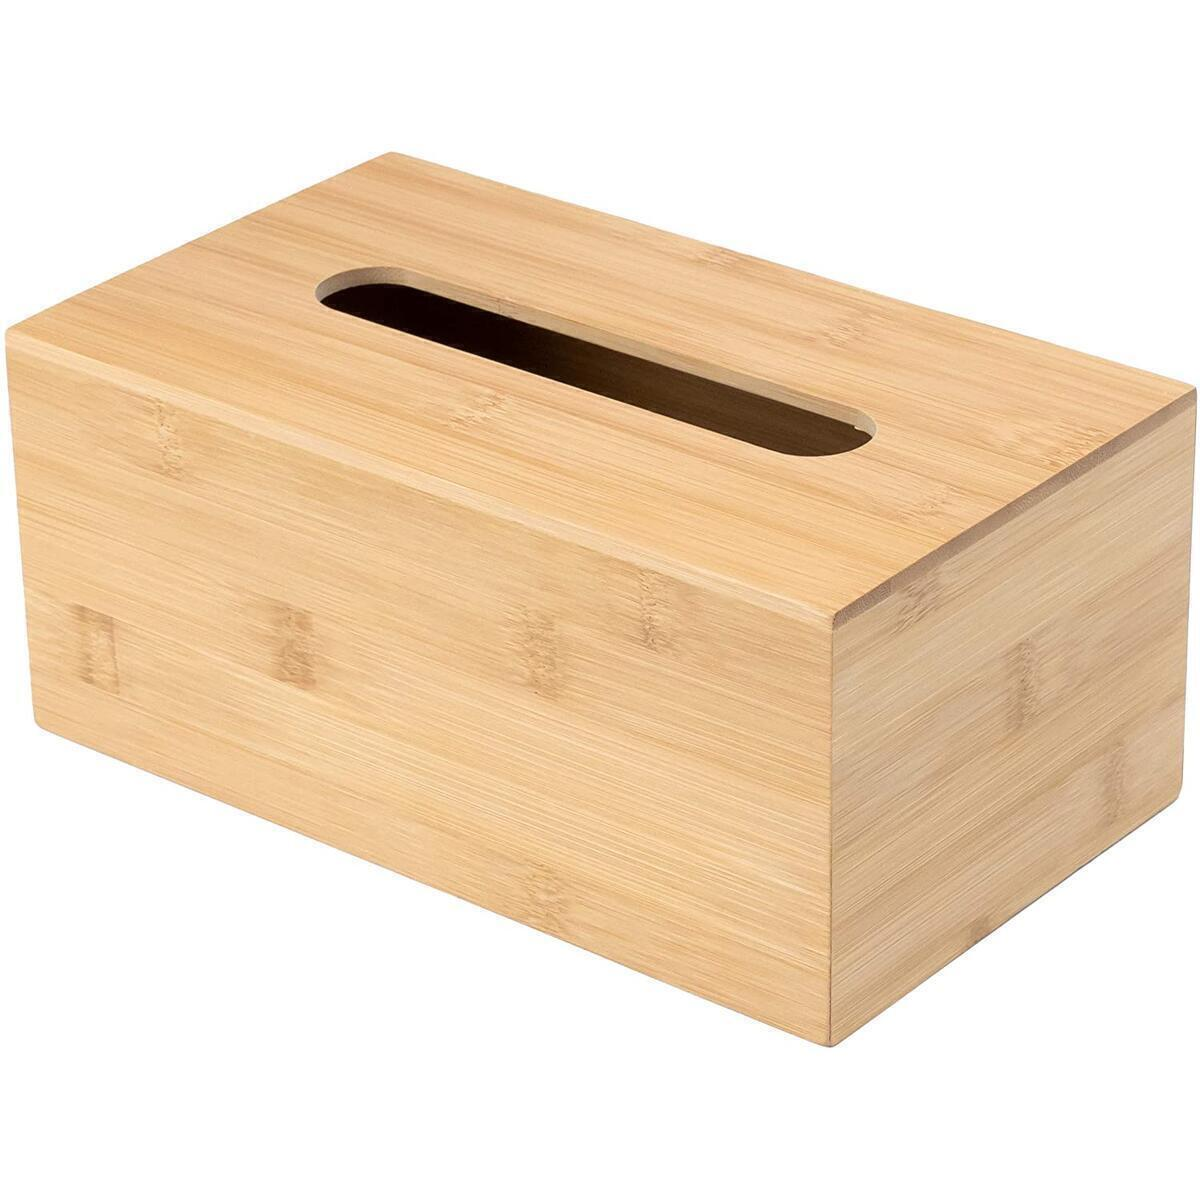 JUSK Design Bamboo Tissue Box Holder - Rectangular (Rebate only applies to rectangular box)